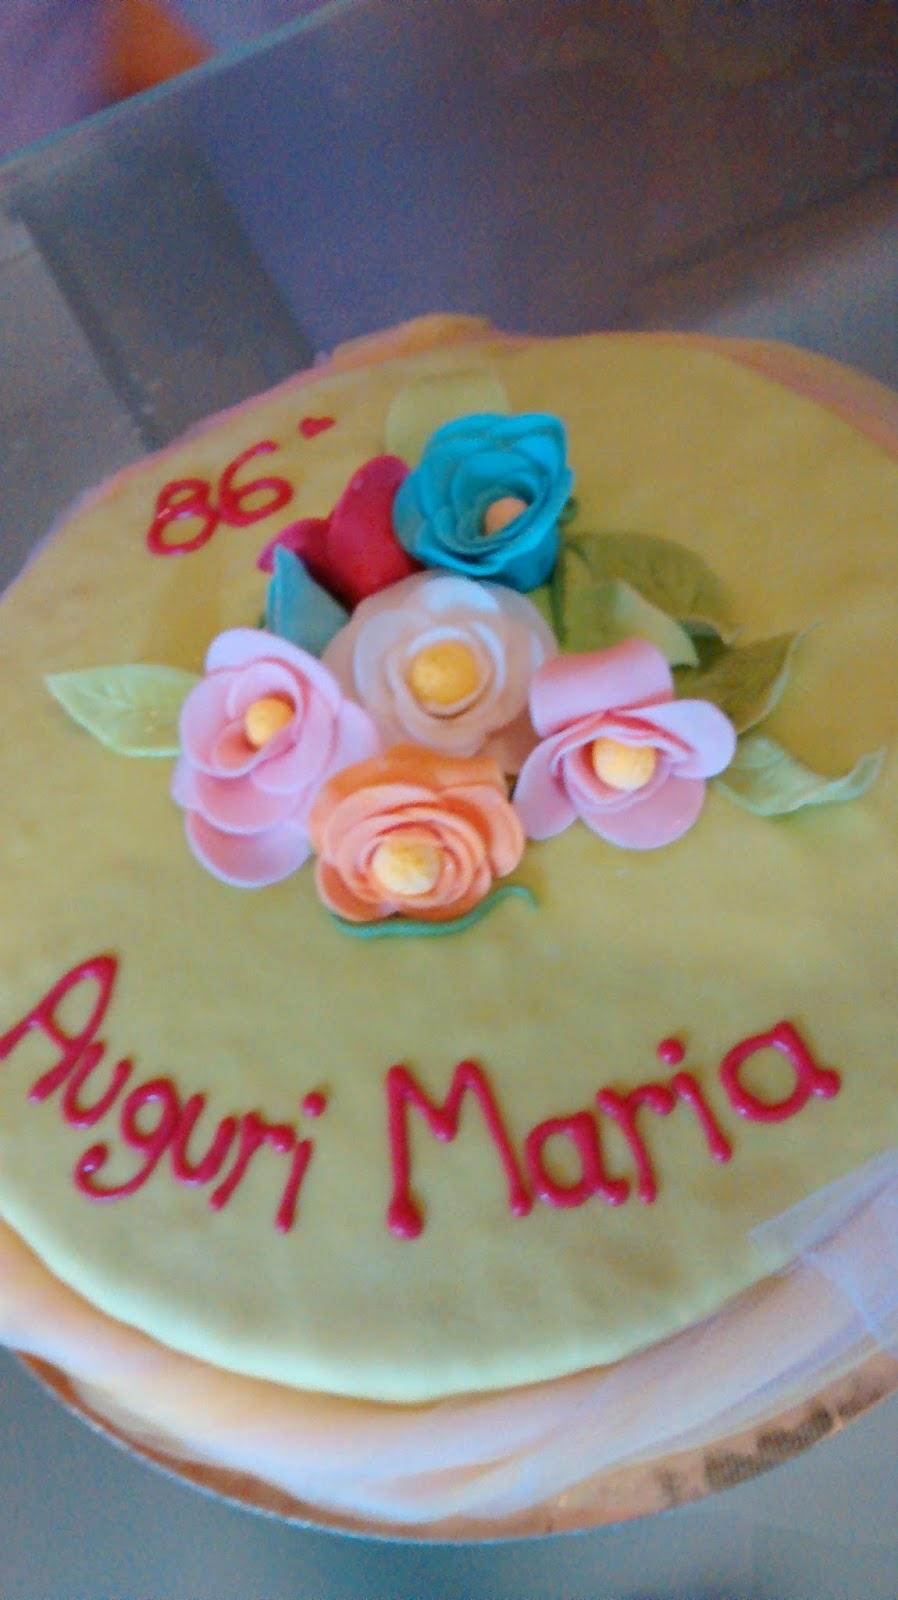 Corsi Di Cake Design Torino 2018 : MagicaFlo Cake Design Cuneo: Auguri Maria!